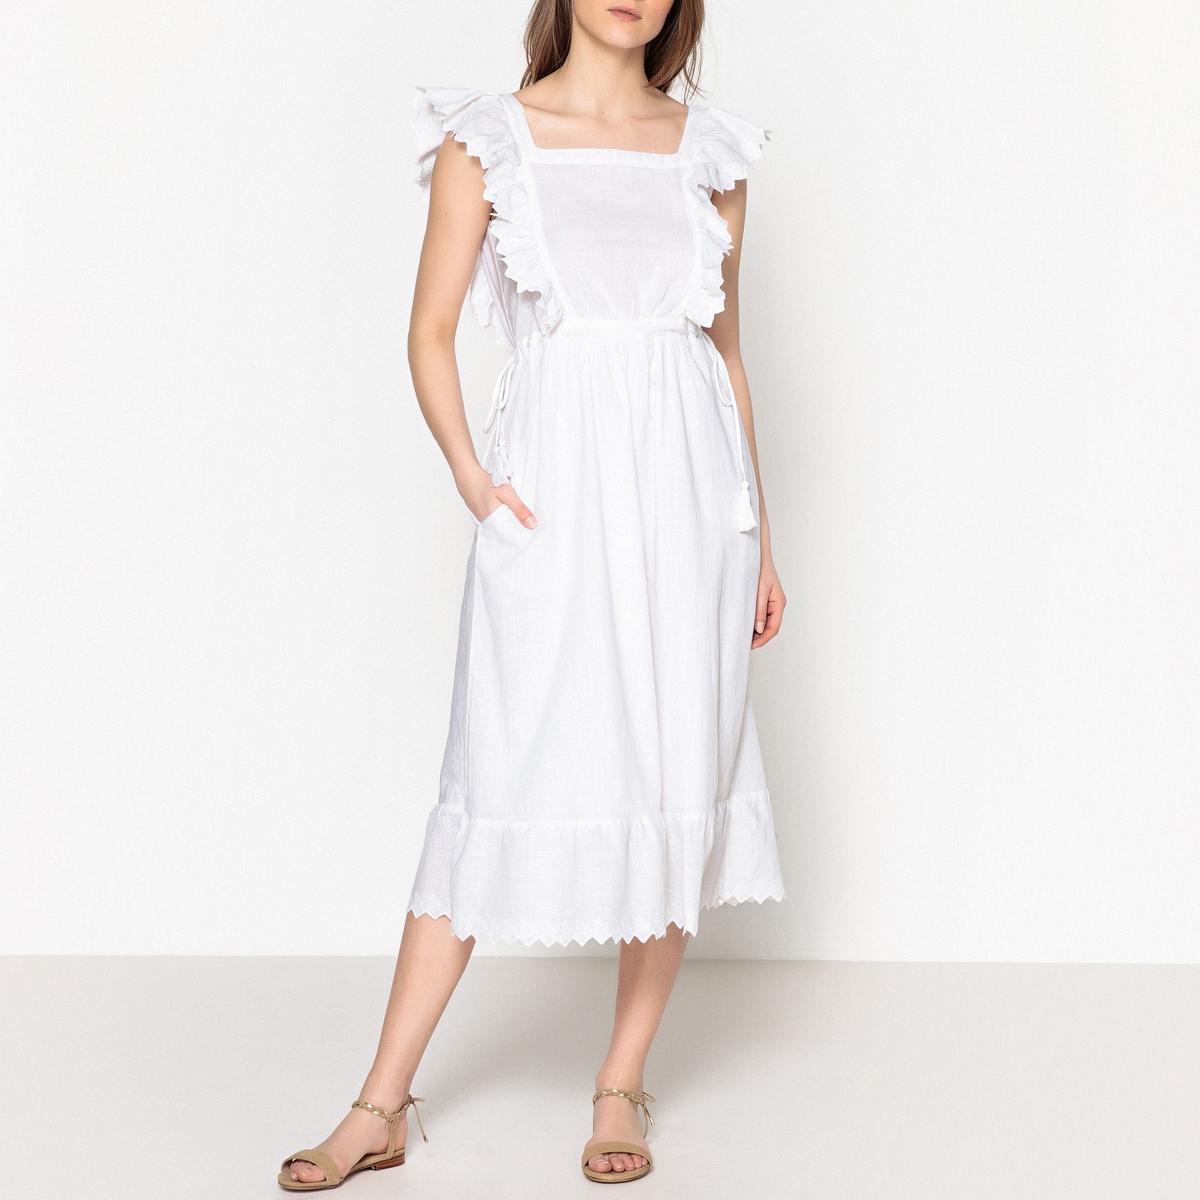 Платье летнее без рукавов с воланами ROYAL от LEON and HARPER